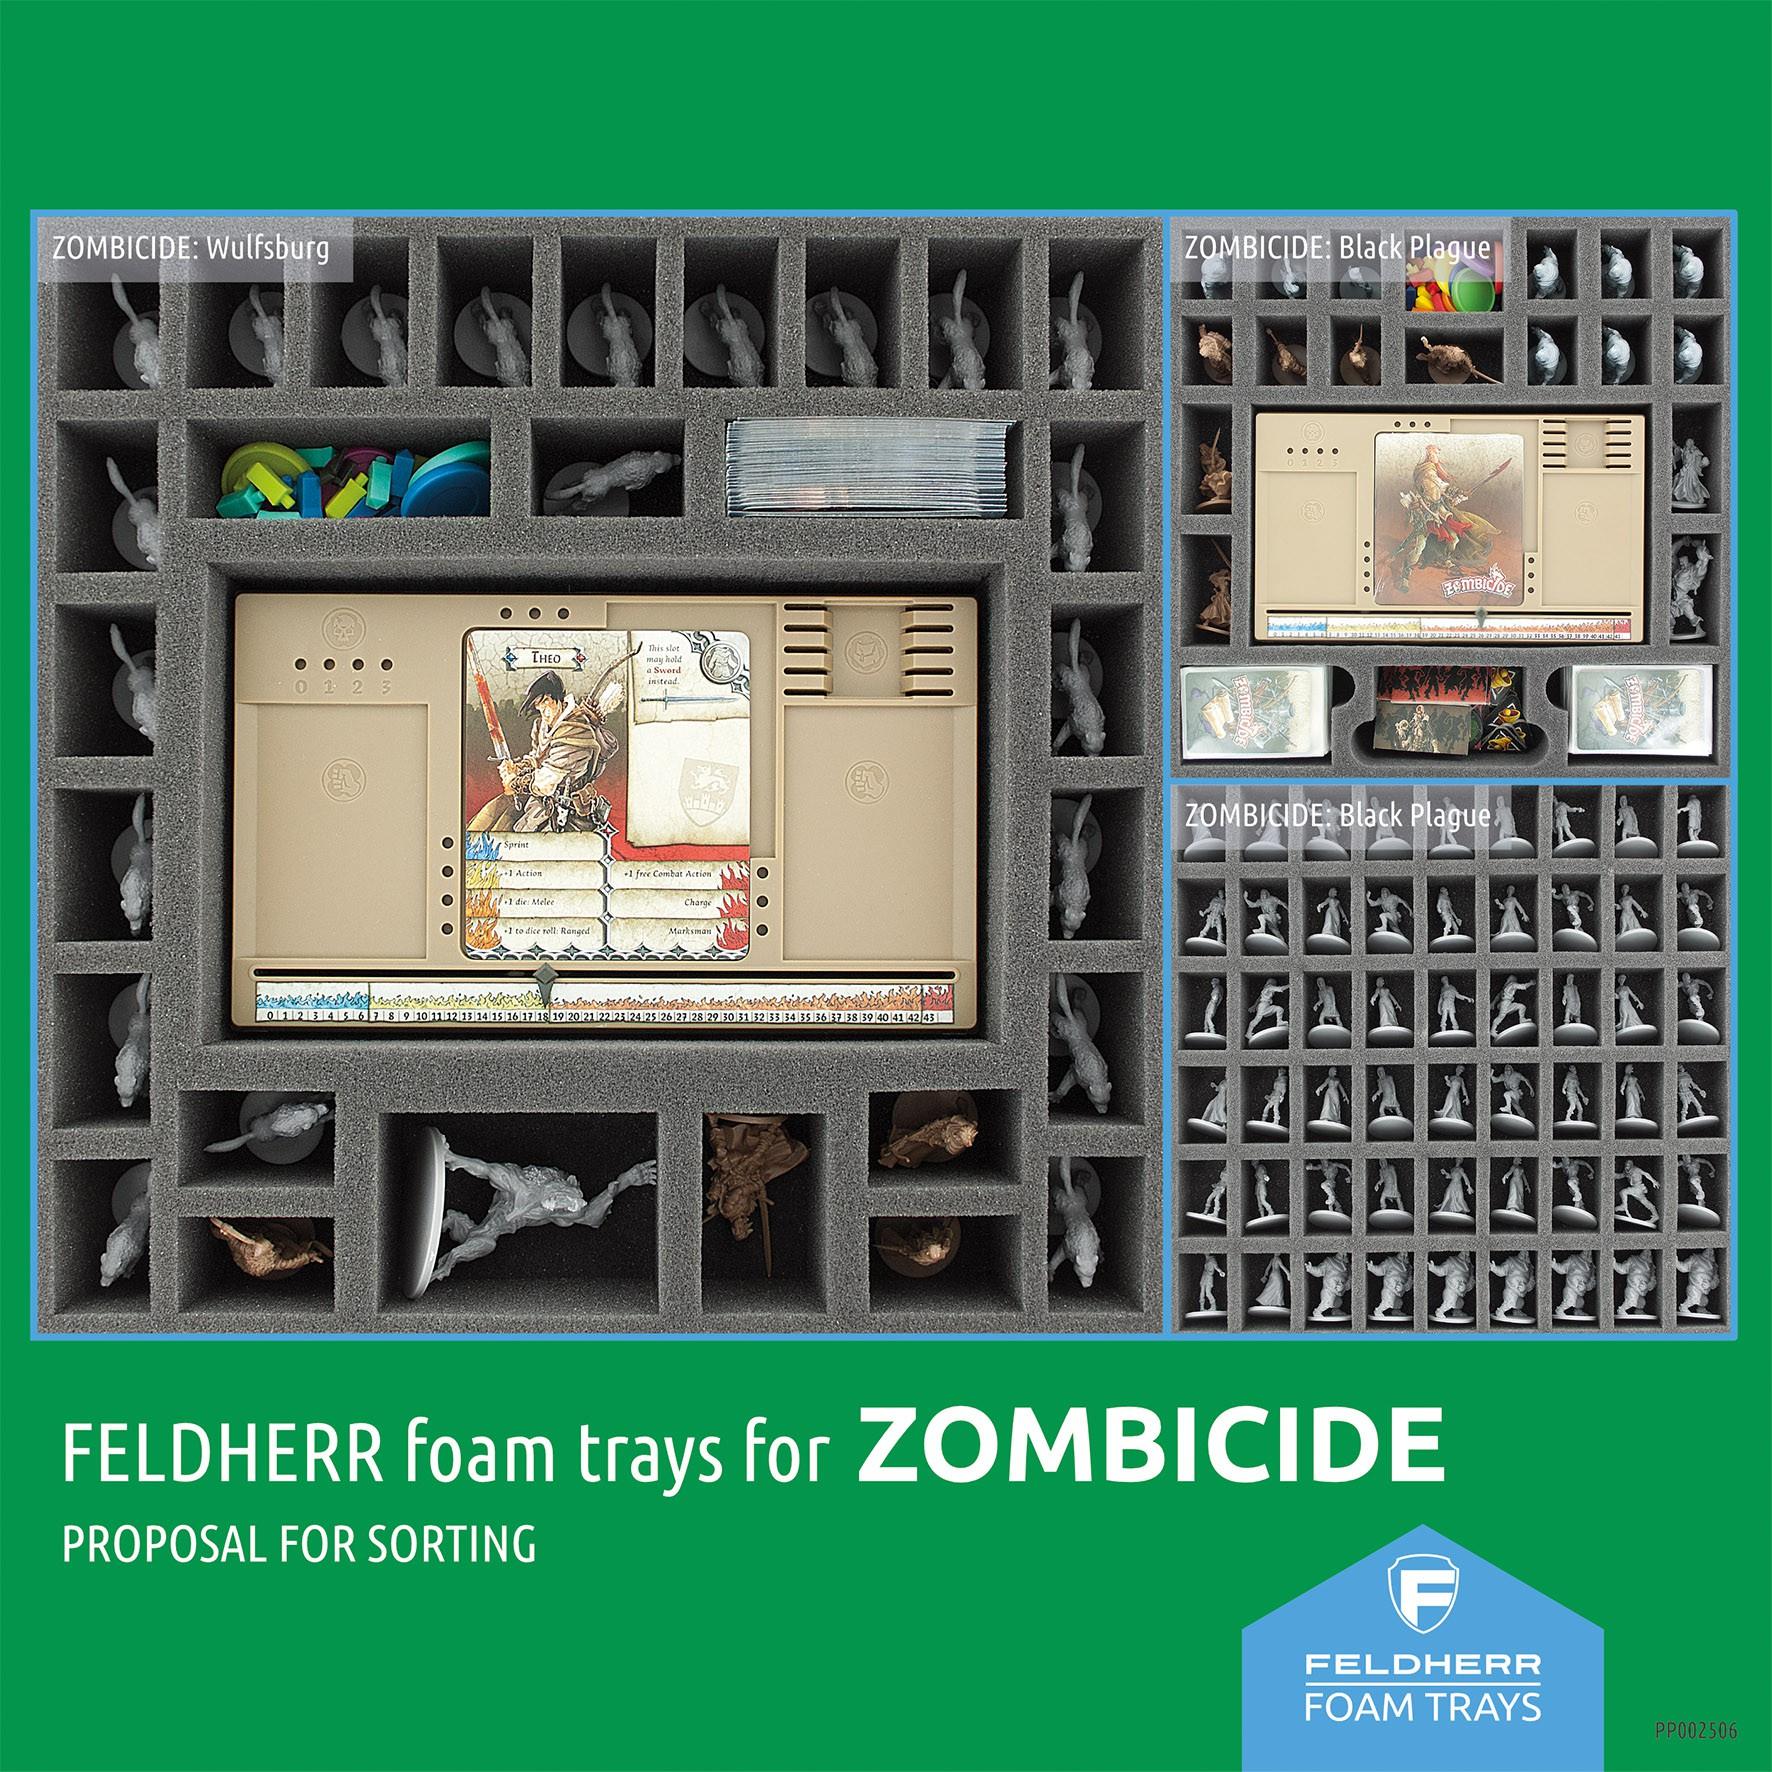 PP002506 - Flyer for Zombicide: Black Plague